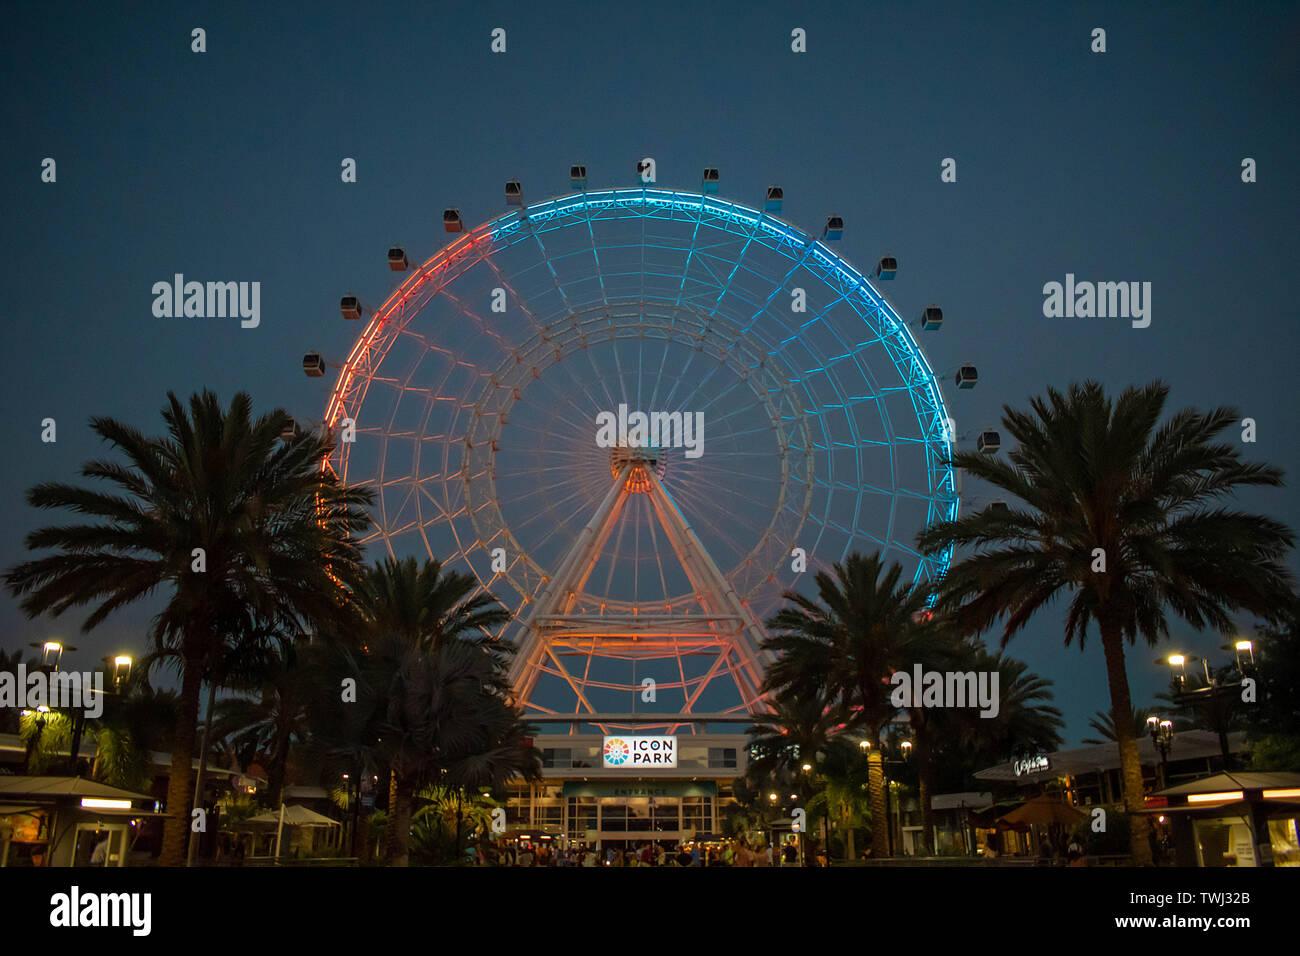 Orlando, Florida. May 26, 2019. Orlando Eye is a 400 feet tall ferris wheel,  in the heart of International Drive area Stock Photo